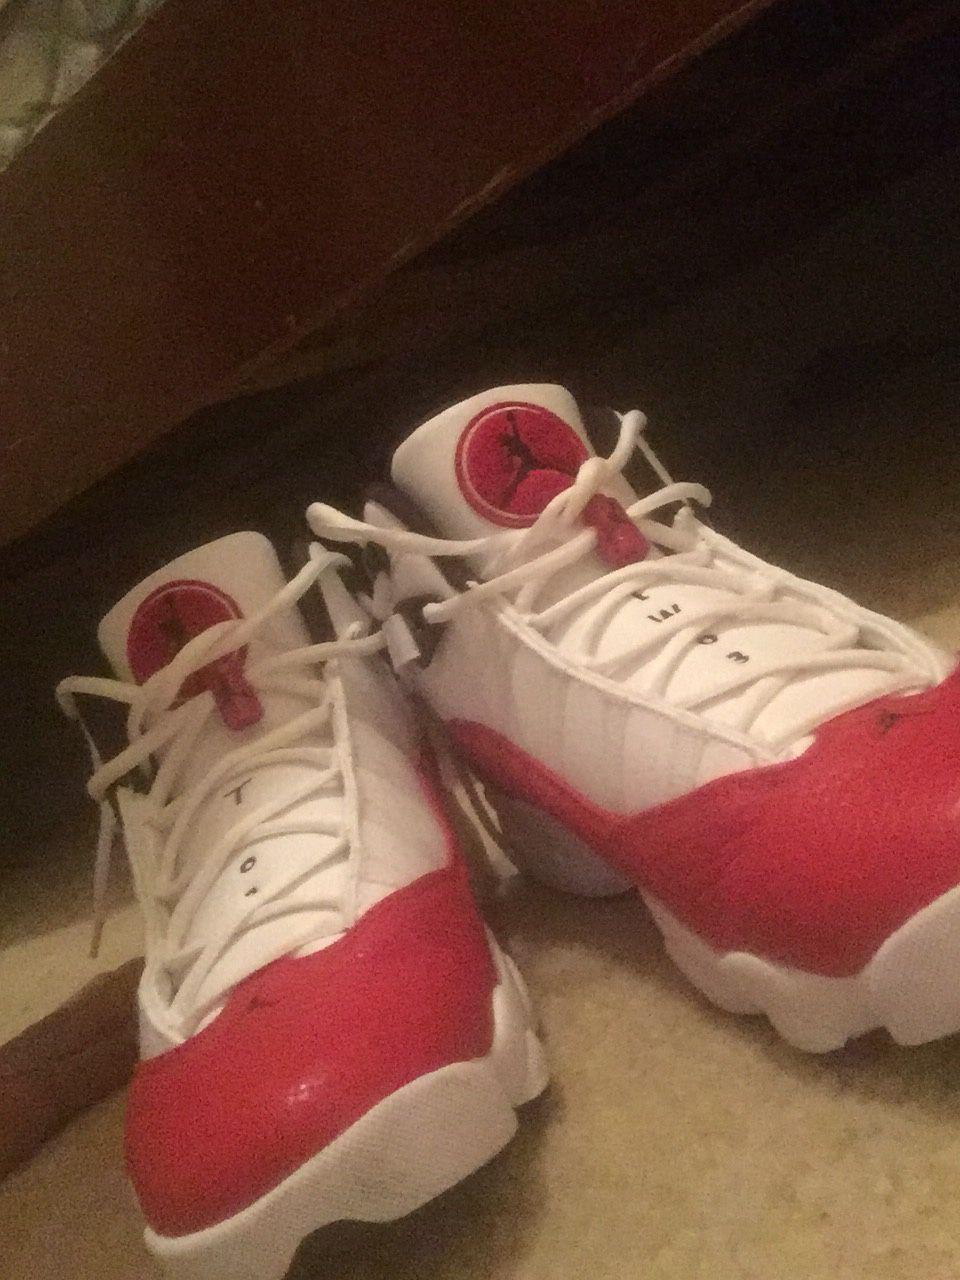 Jordan 6 rings red and white